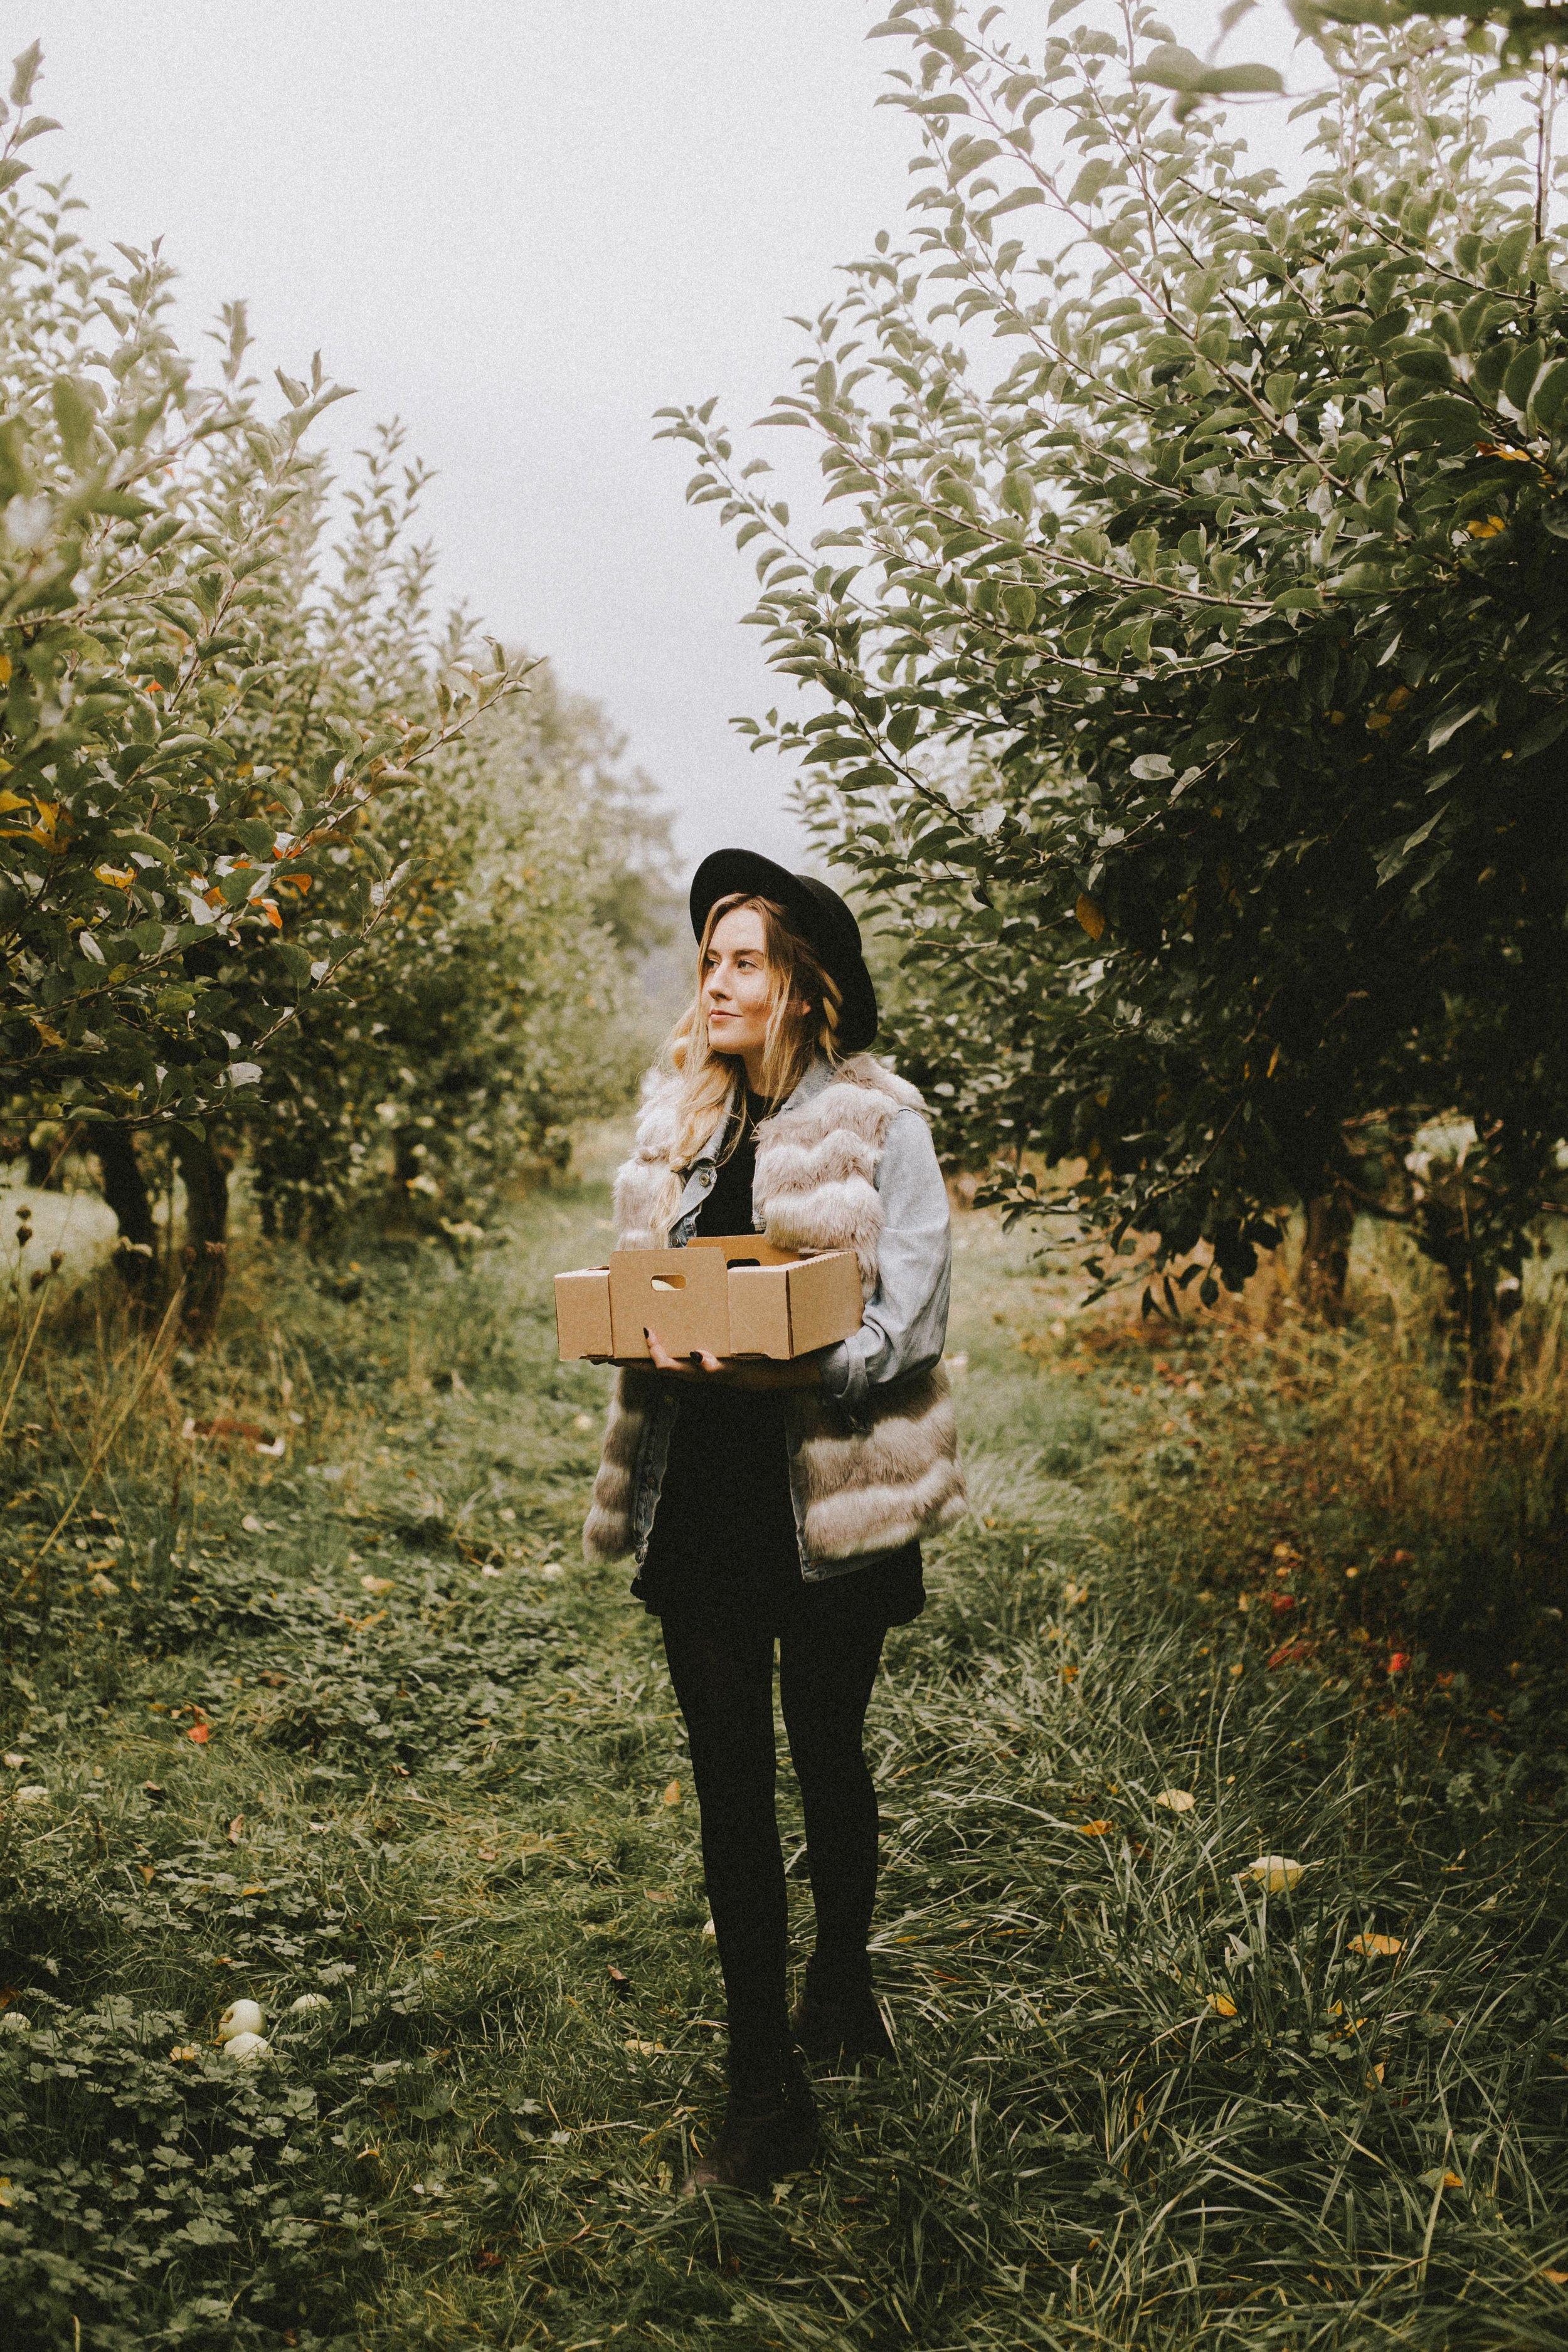 samlandreth-apple-4.jpg